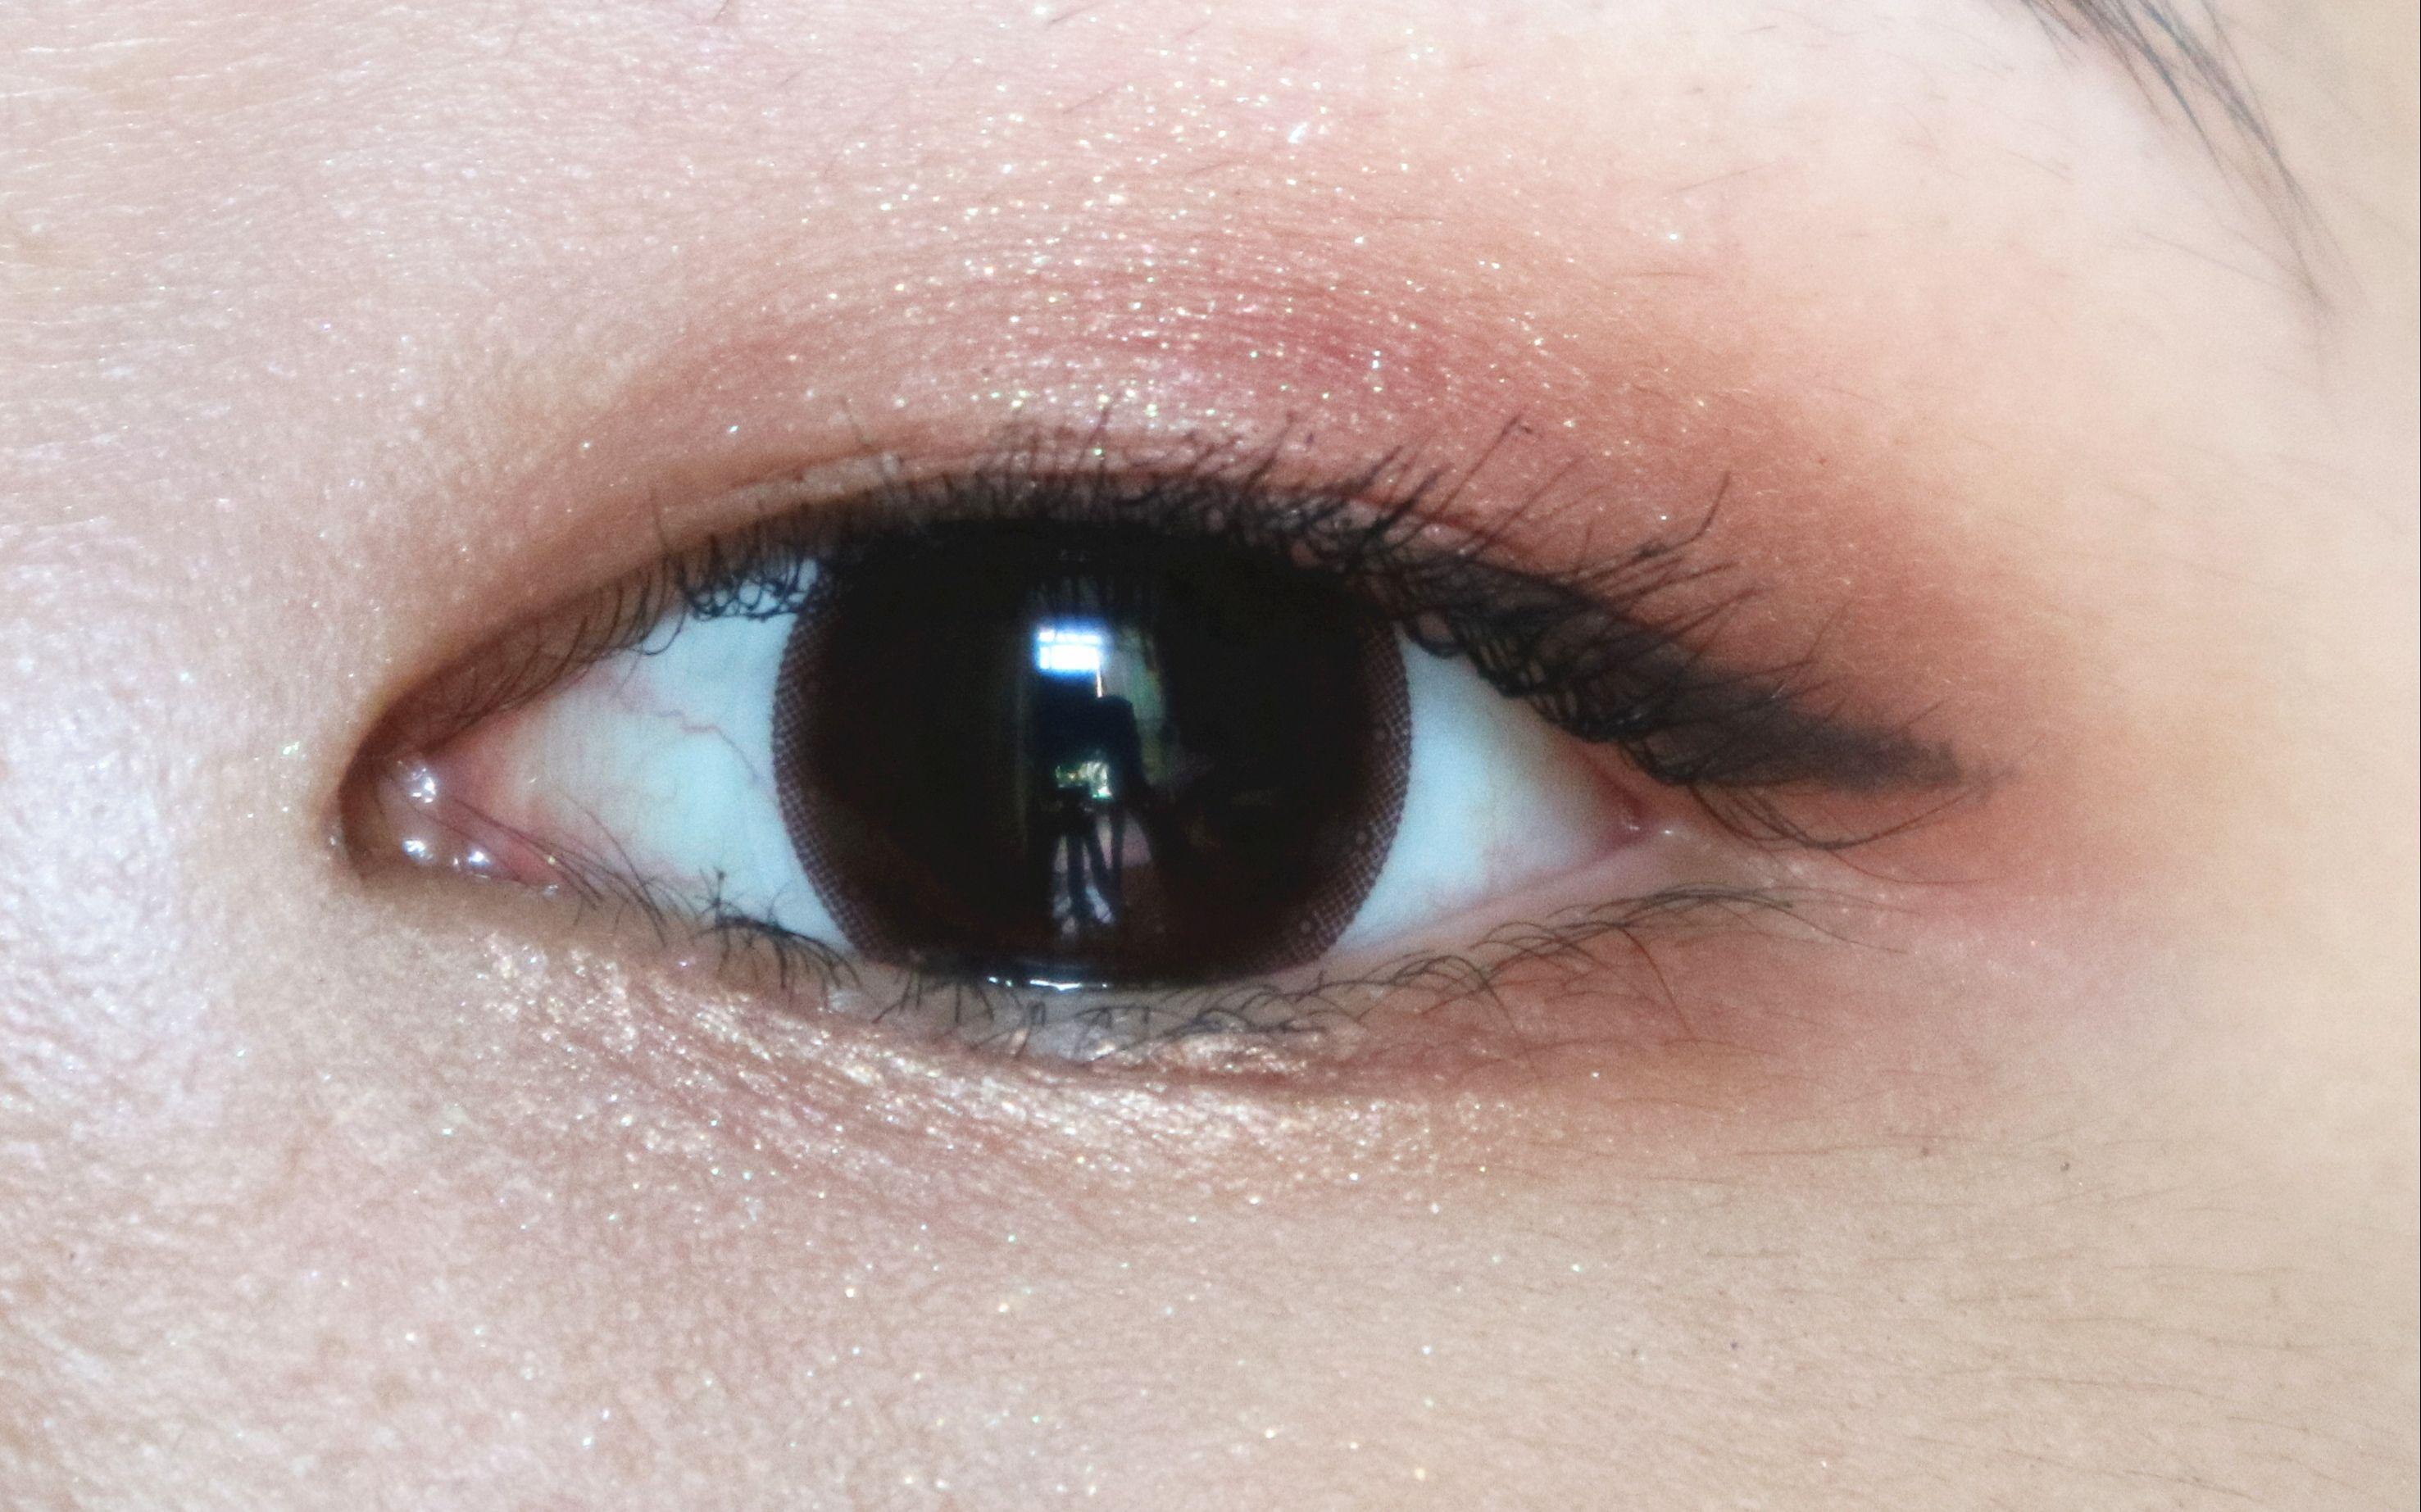 眼妆的画法视频_单眼皮 | 简单向的眼线画法_哔哩哔哩 (゜-゜)つロ 干杯~-bilibili